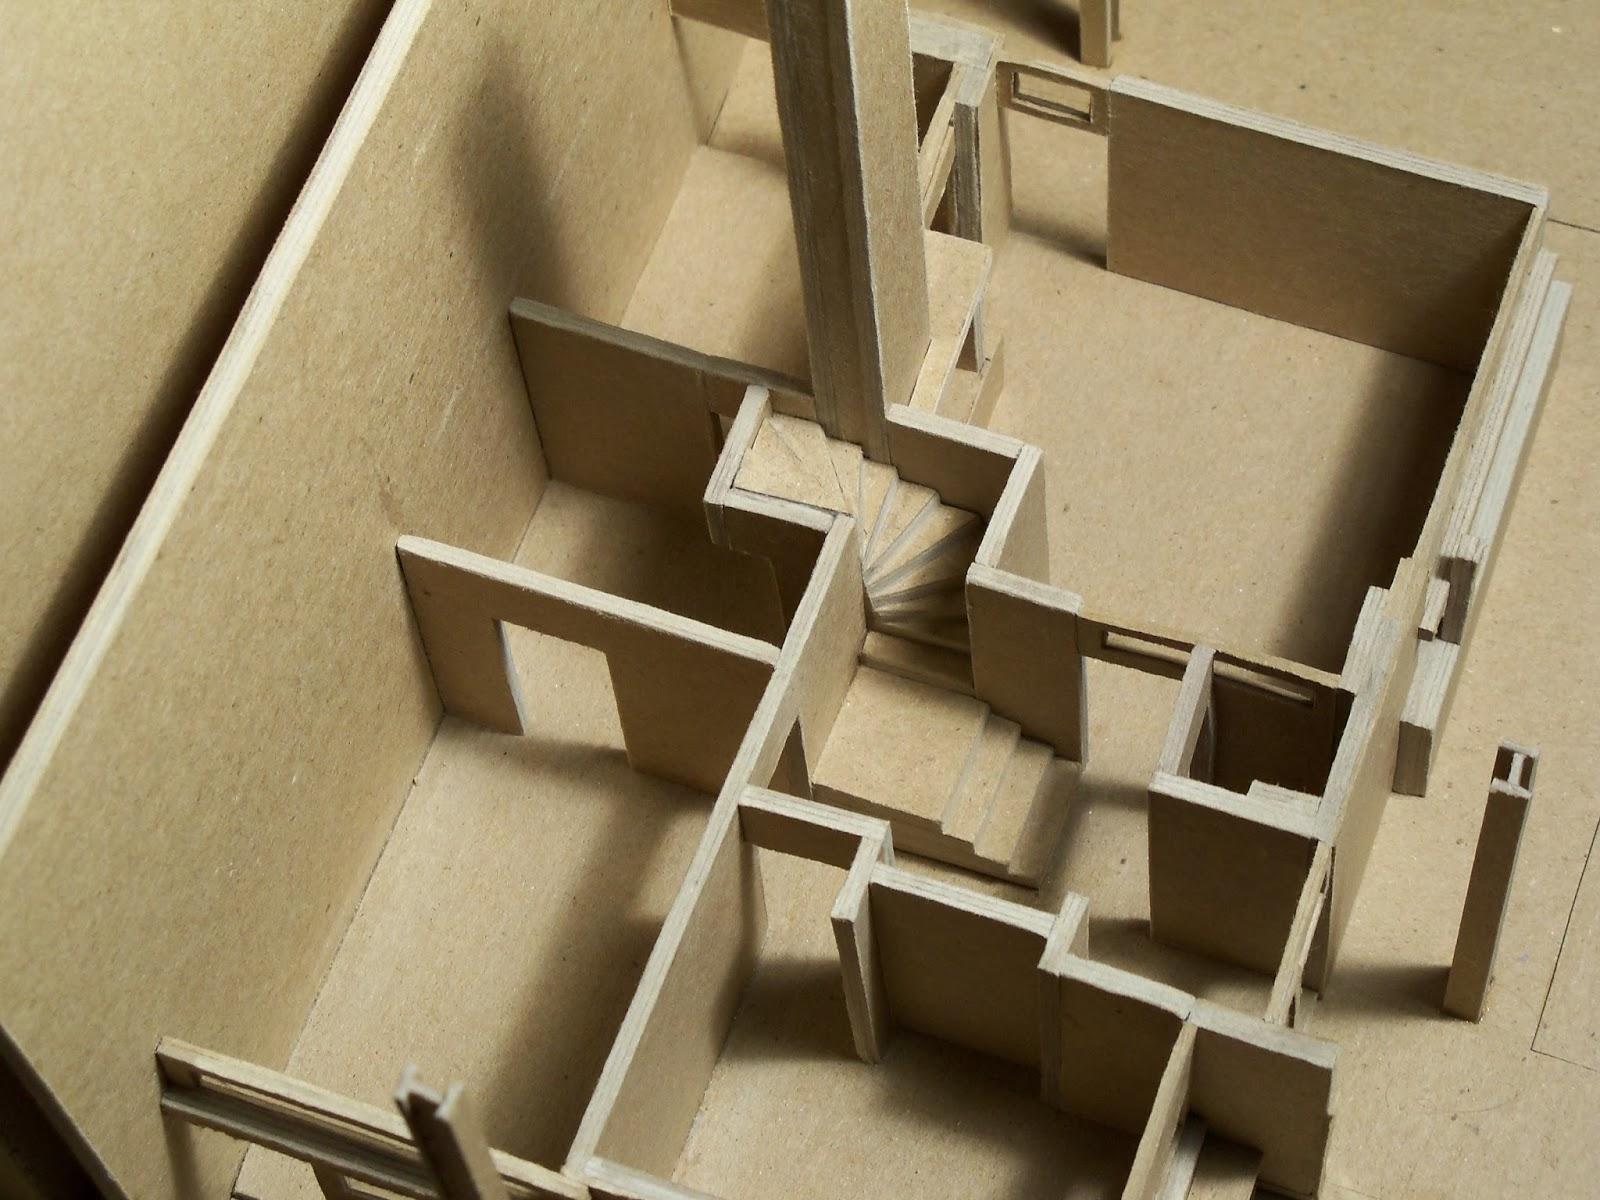 Edward Bauknight Designs Model of the Rietveld Schroder House